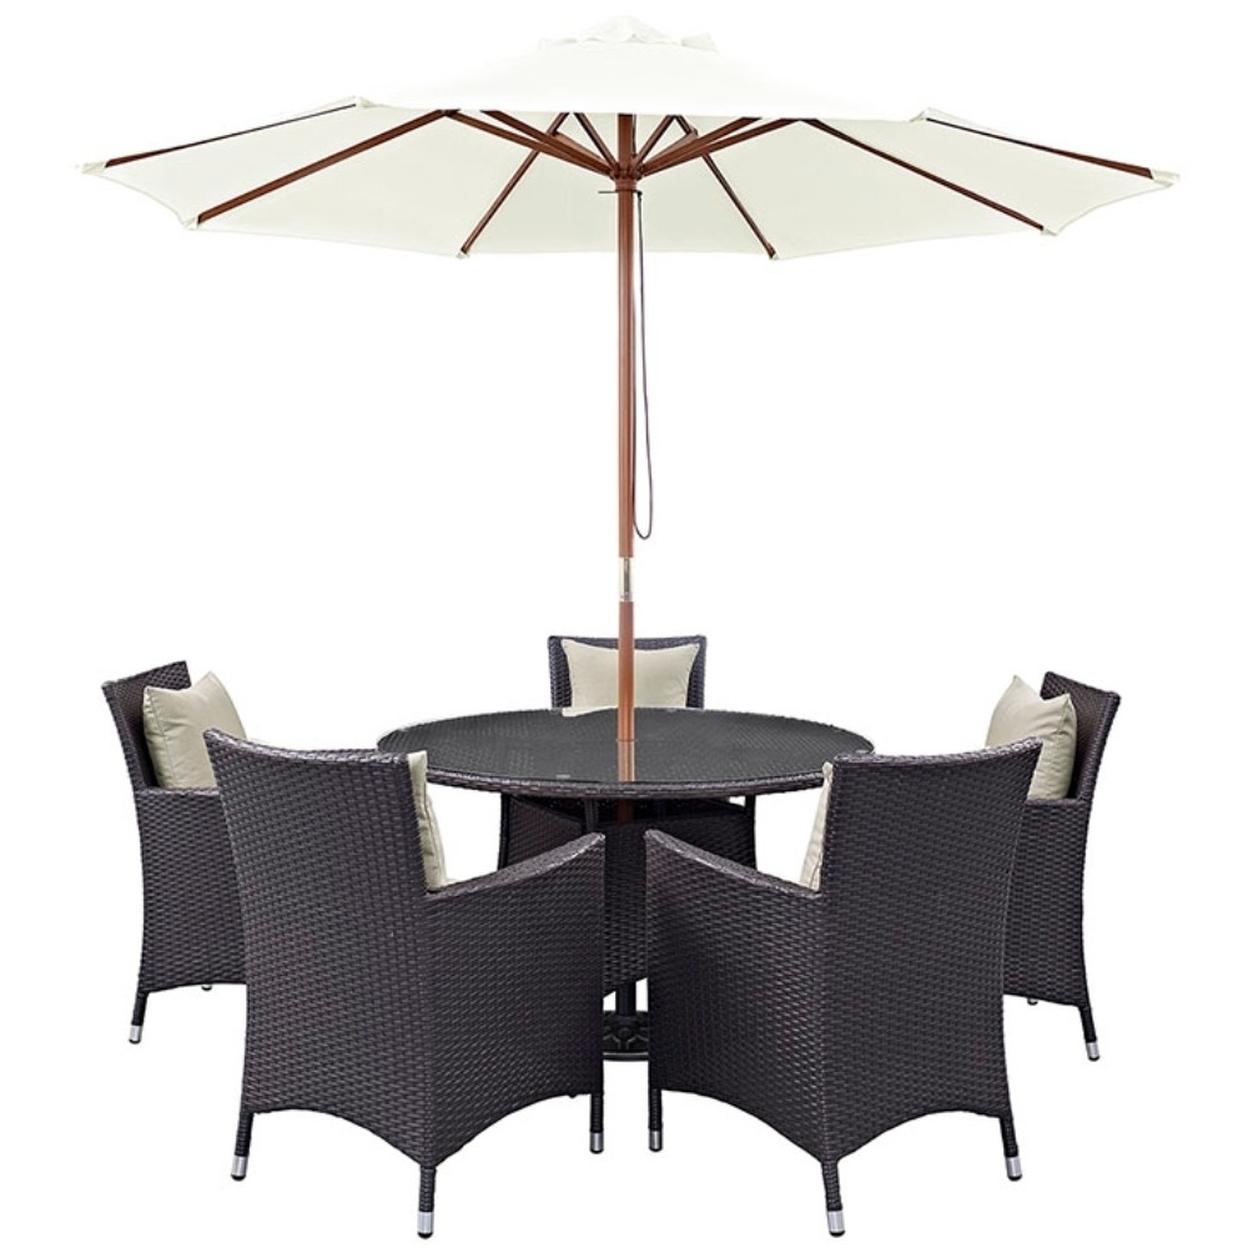 "Convene 7 Piece Outdoor Patio Dining Set, Espresso Beige Size : 47\""lx47\""wx29\""h"